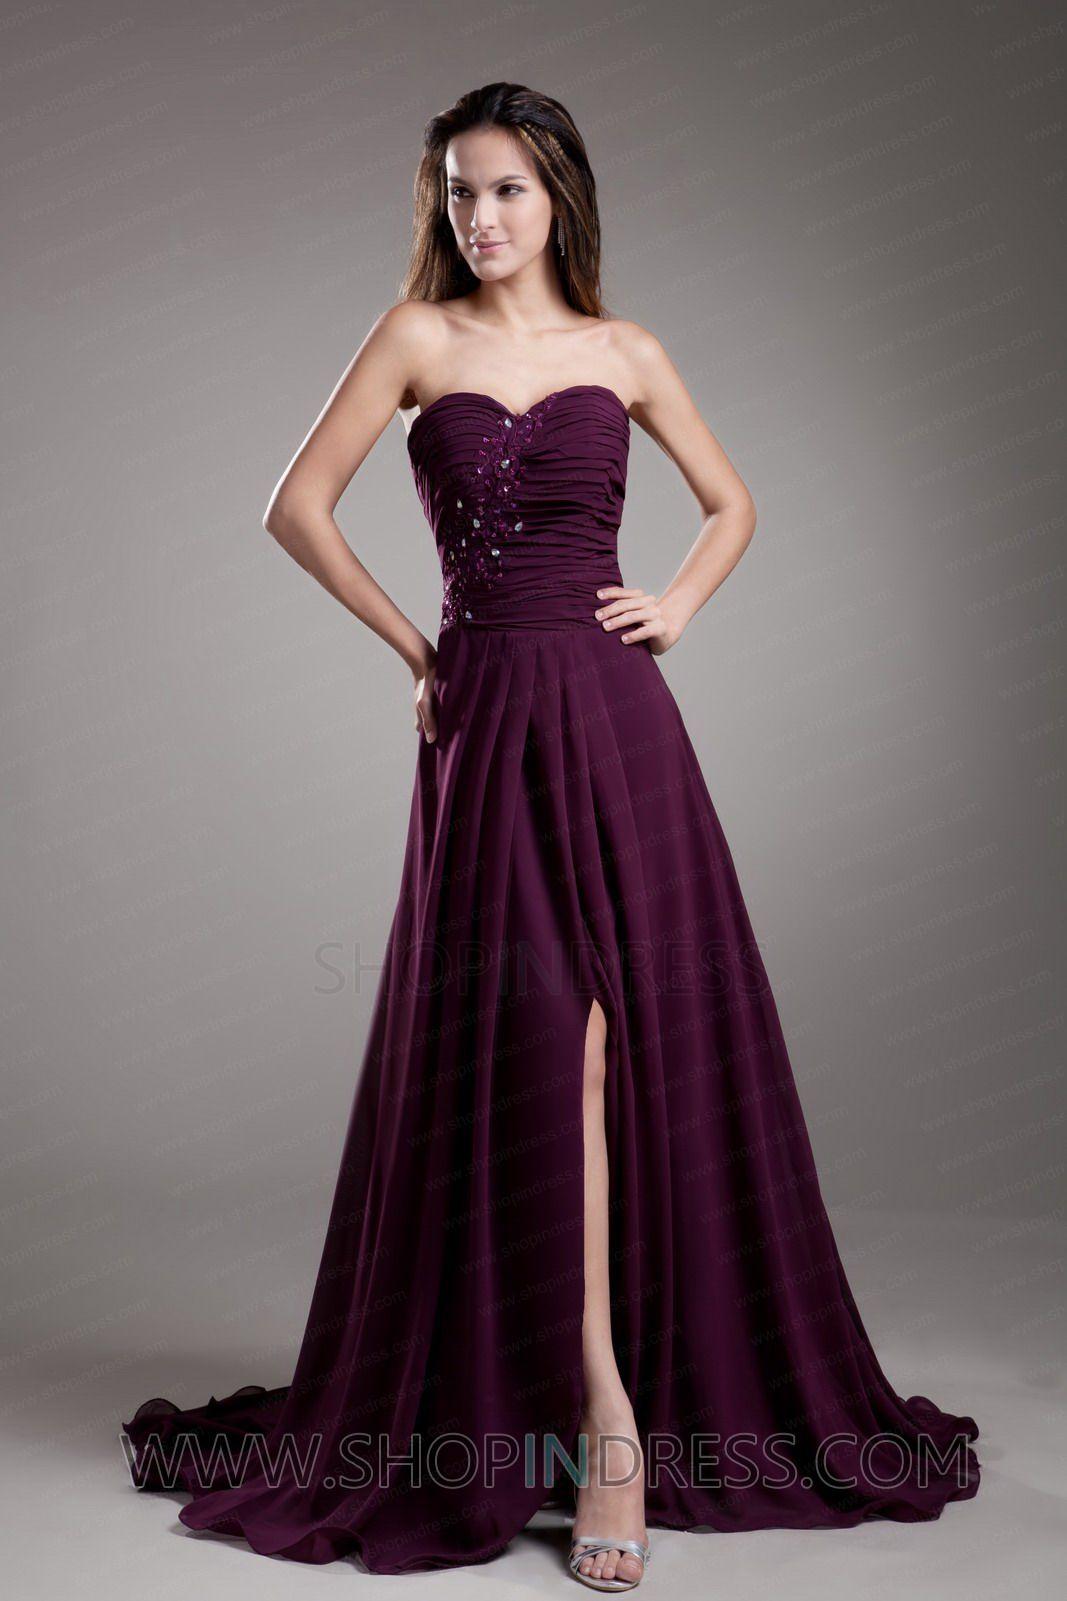 1000  images about Bridesmaids dresses on Pinterest - Plum prom ...